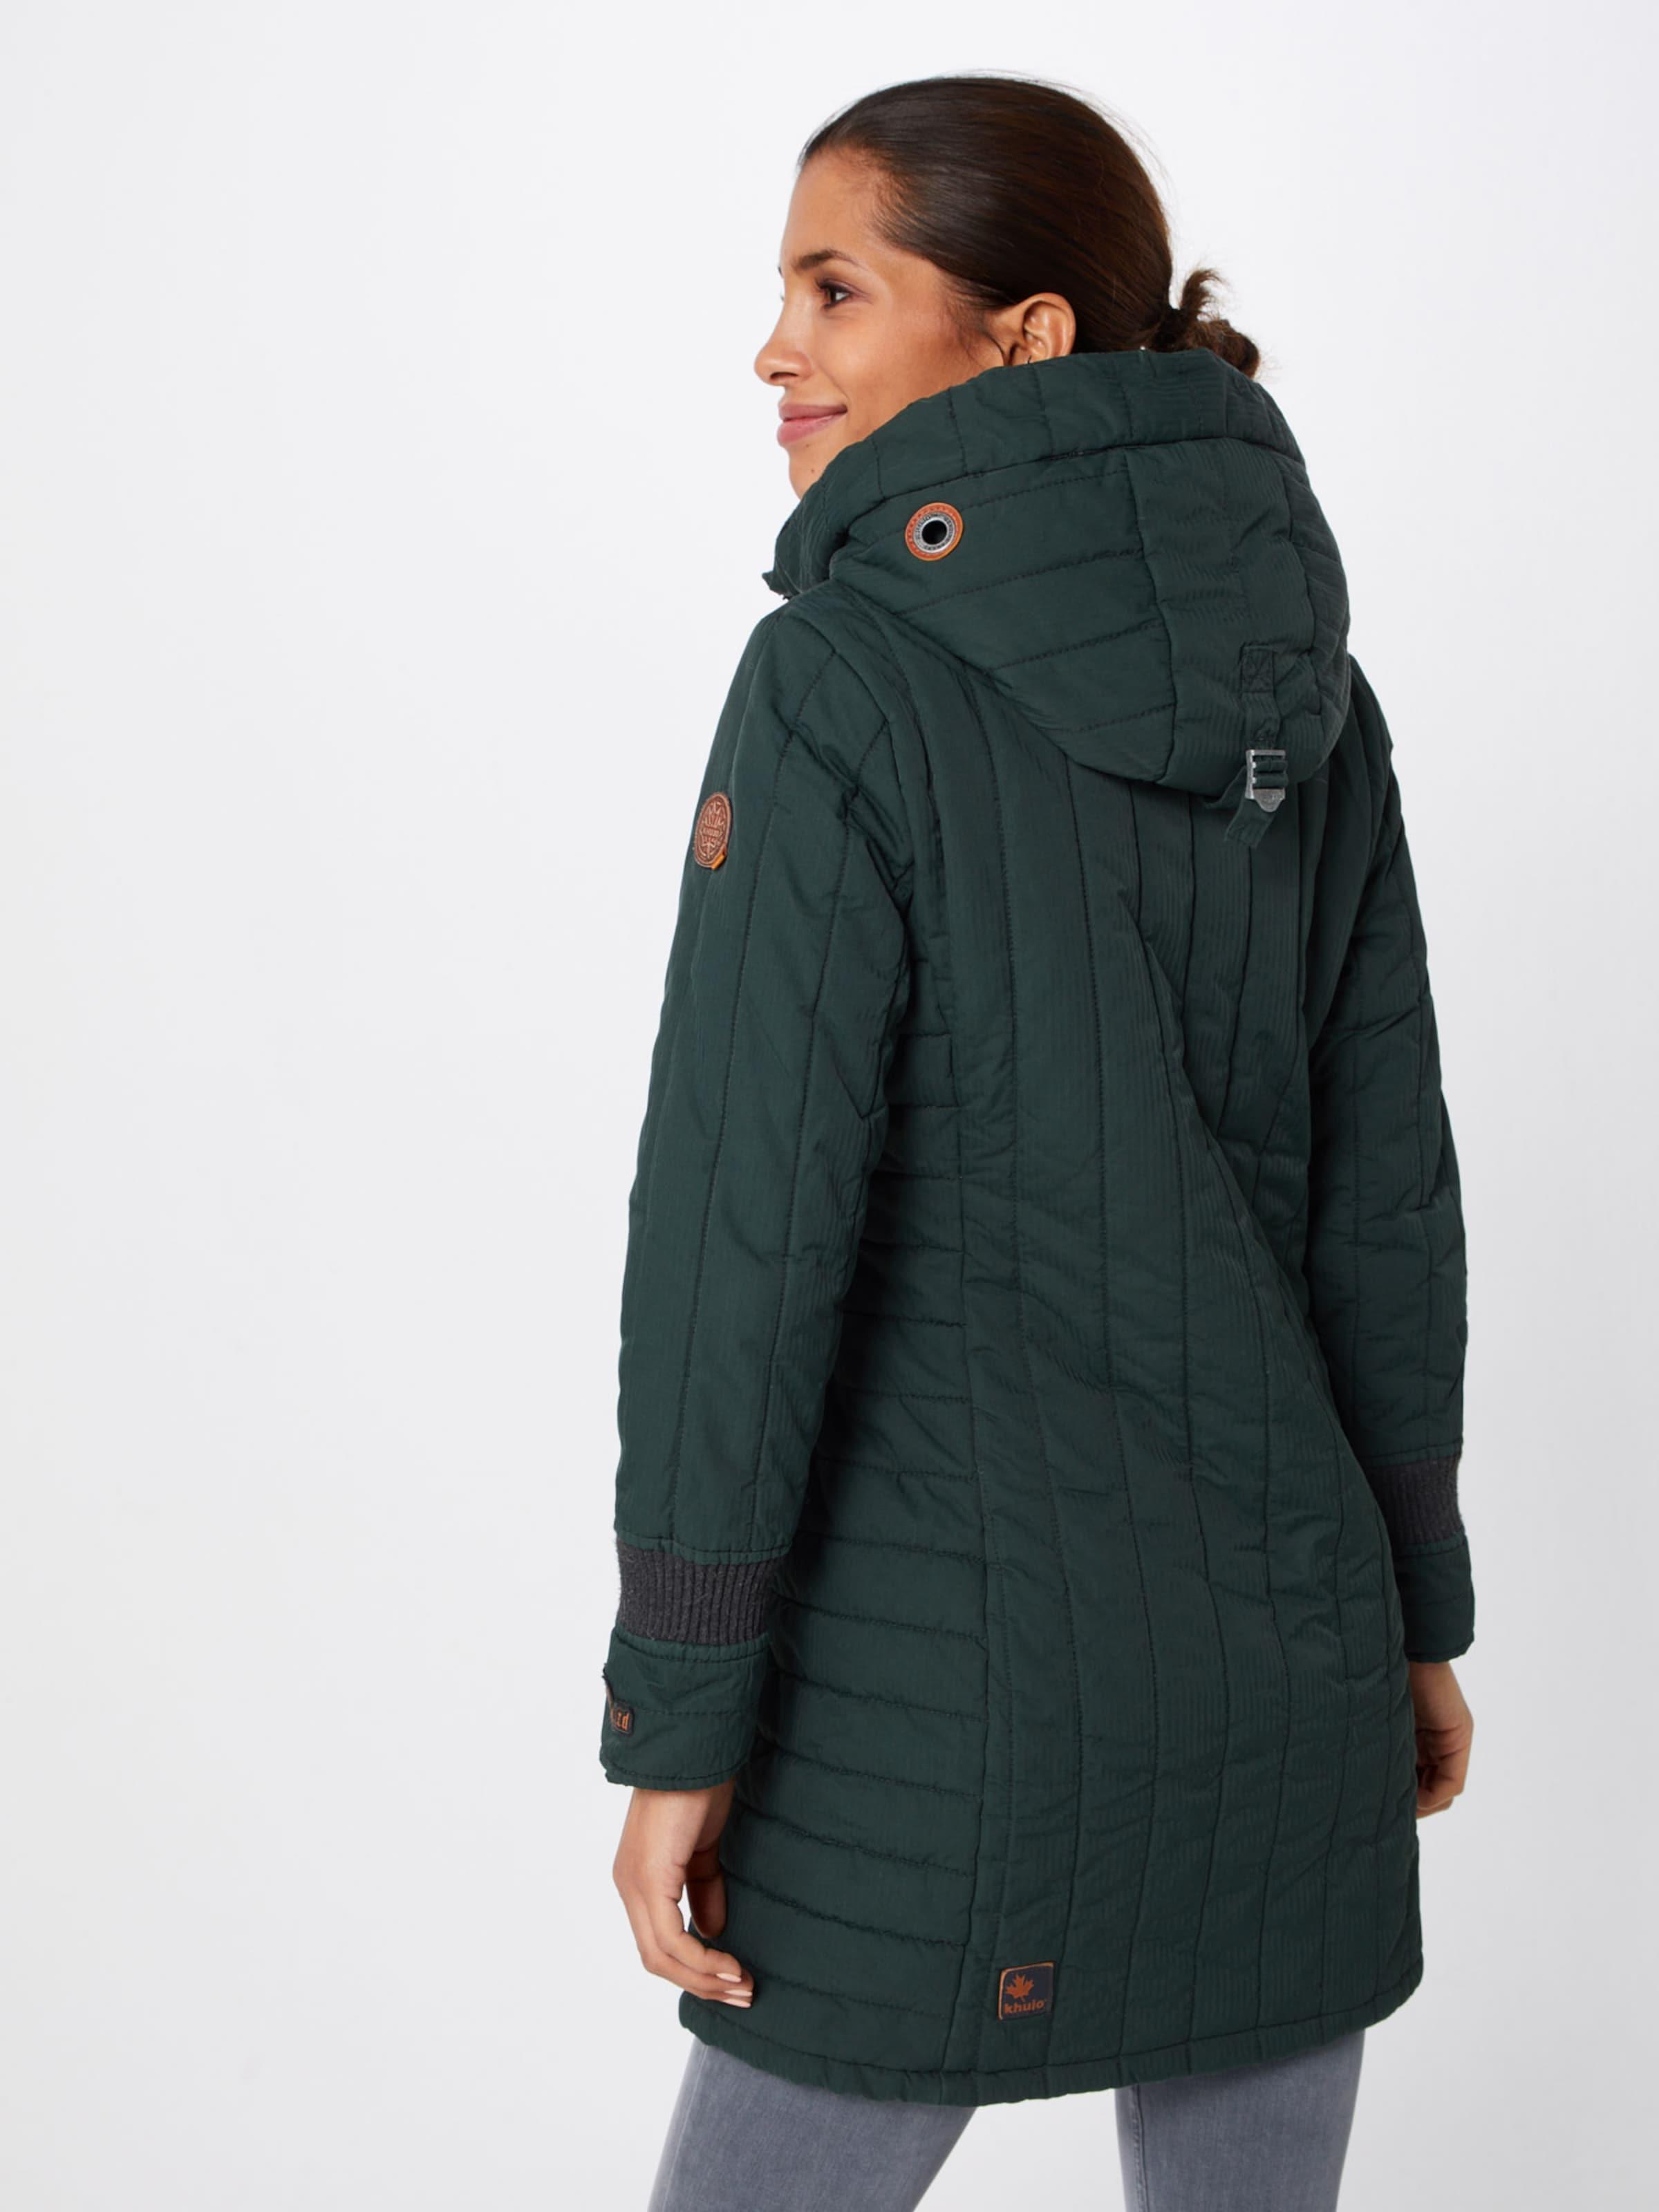 Vert D'hiver Khujo Prime2' 'jerry Manteau En 4j53RAL